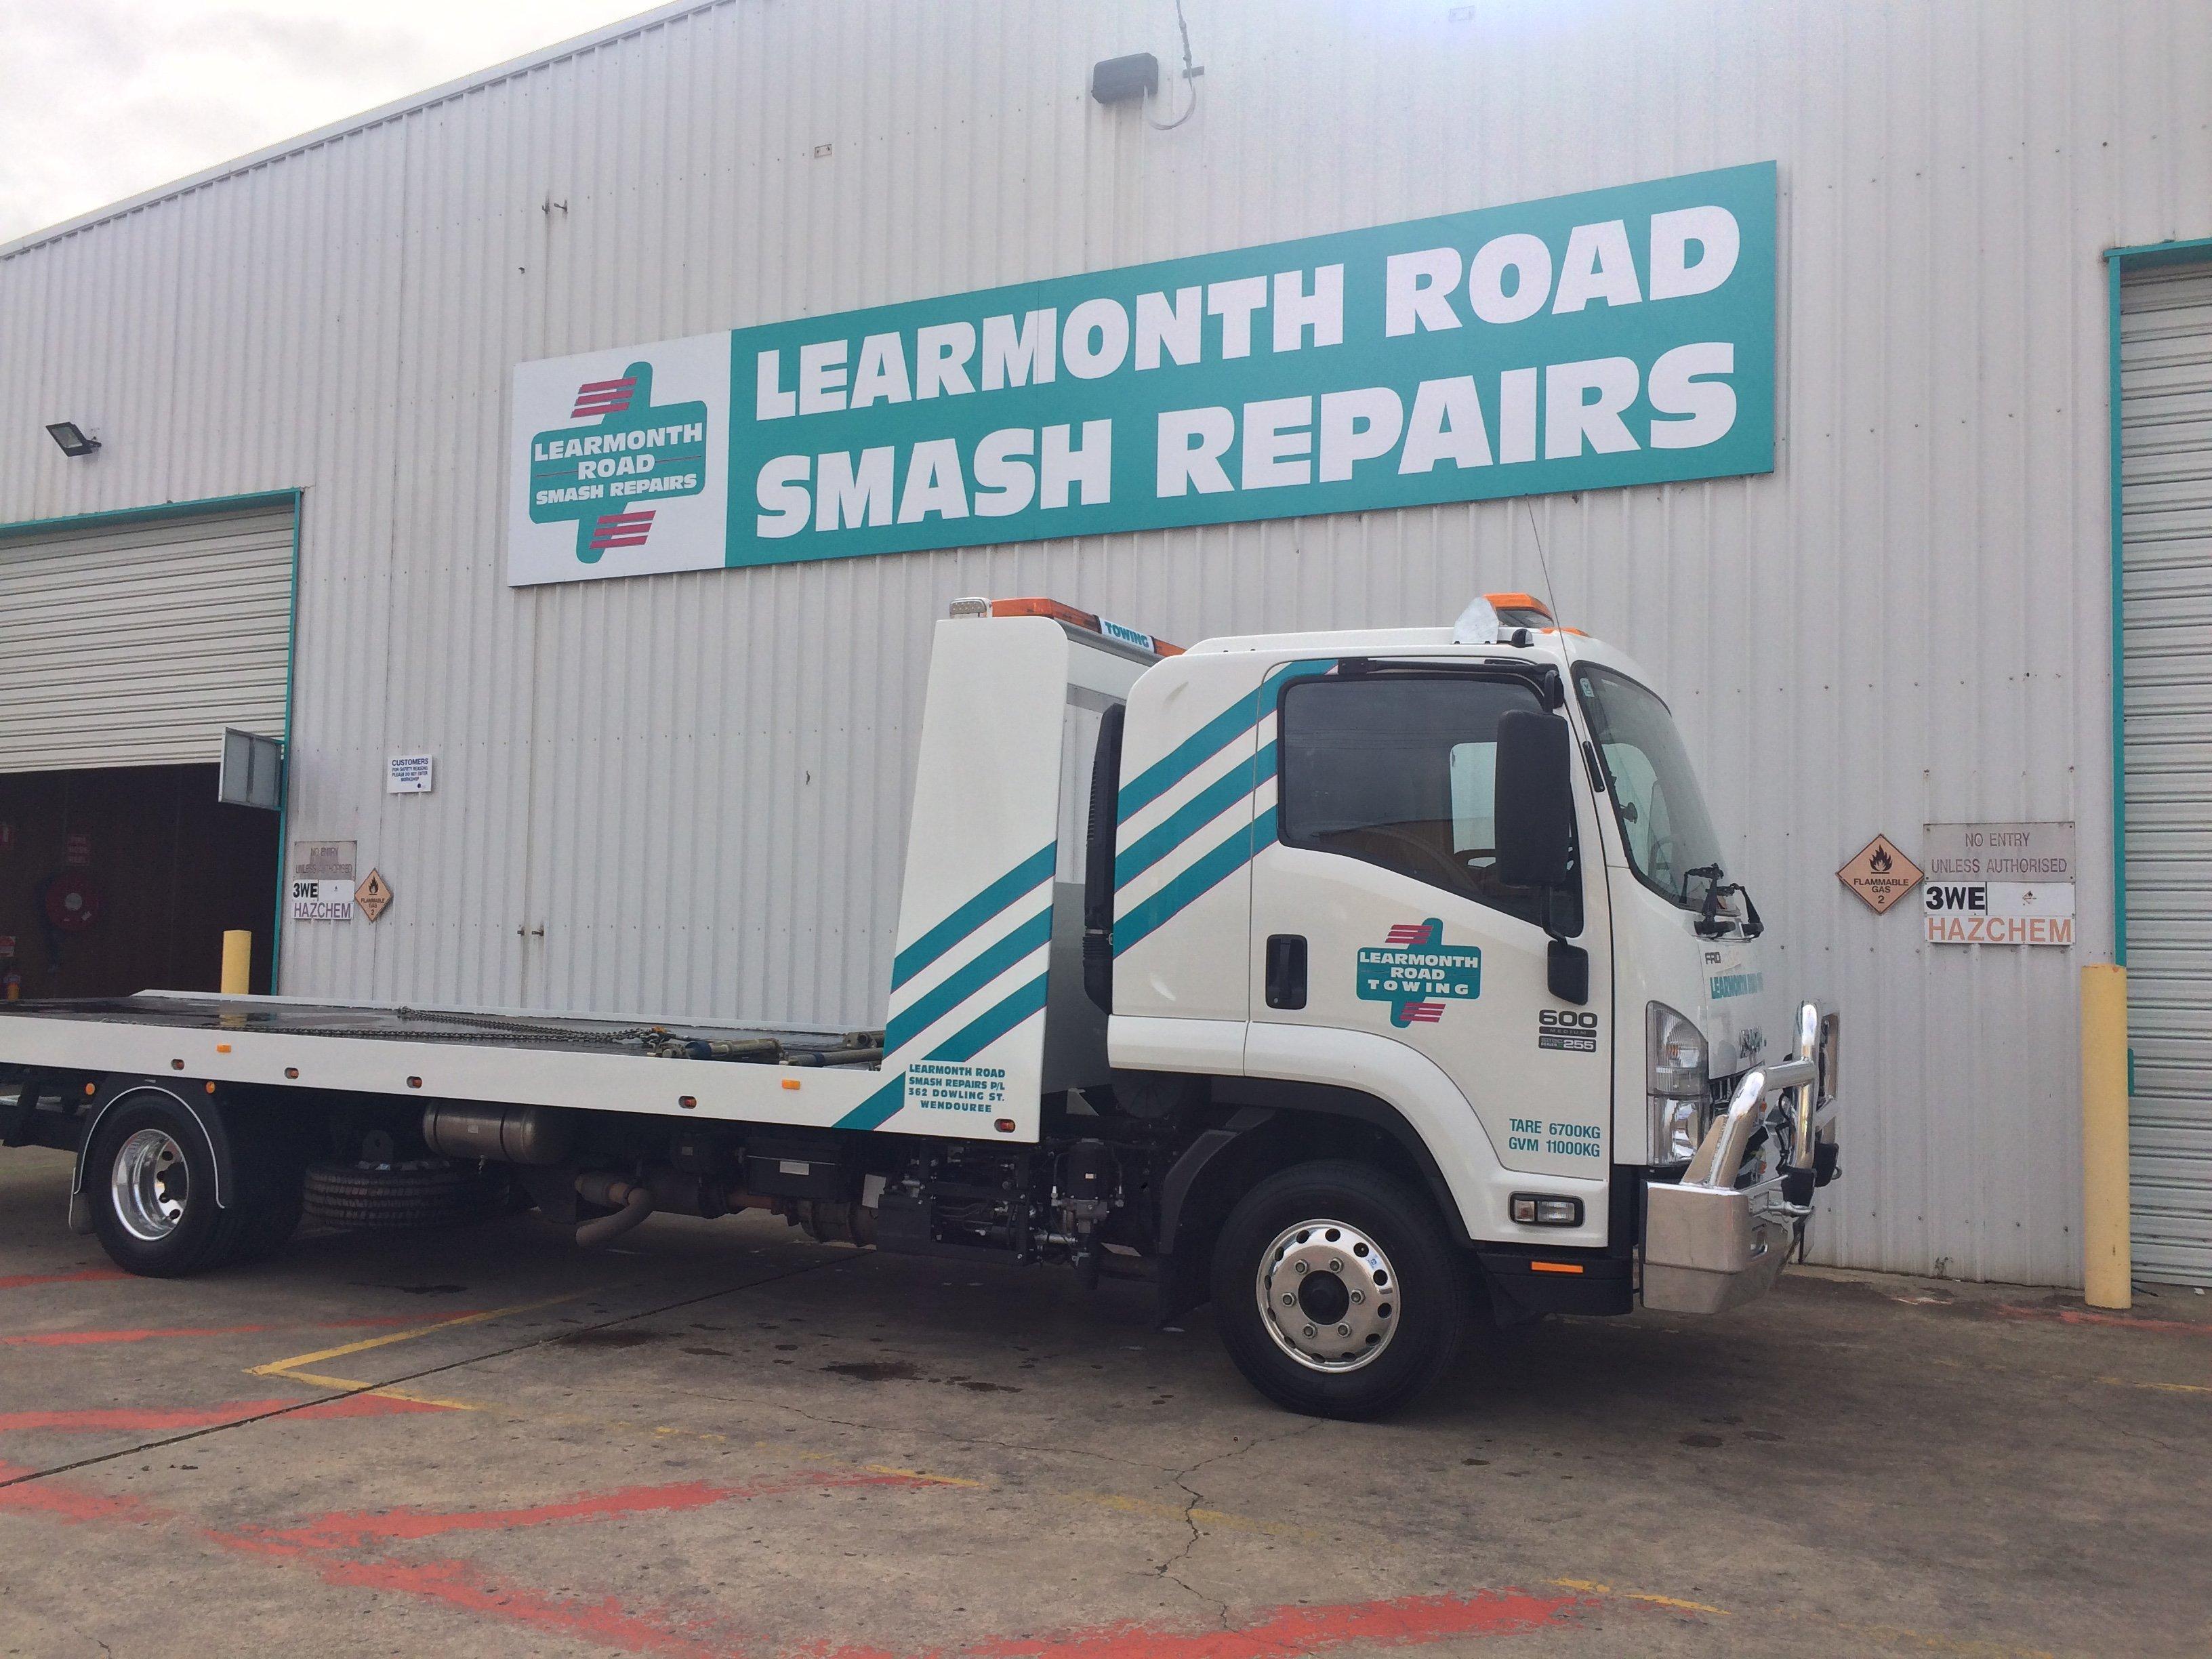 learmont road smash repairs smiling tow truck